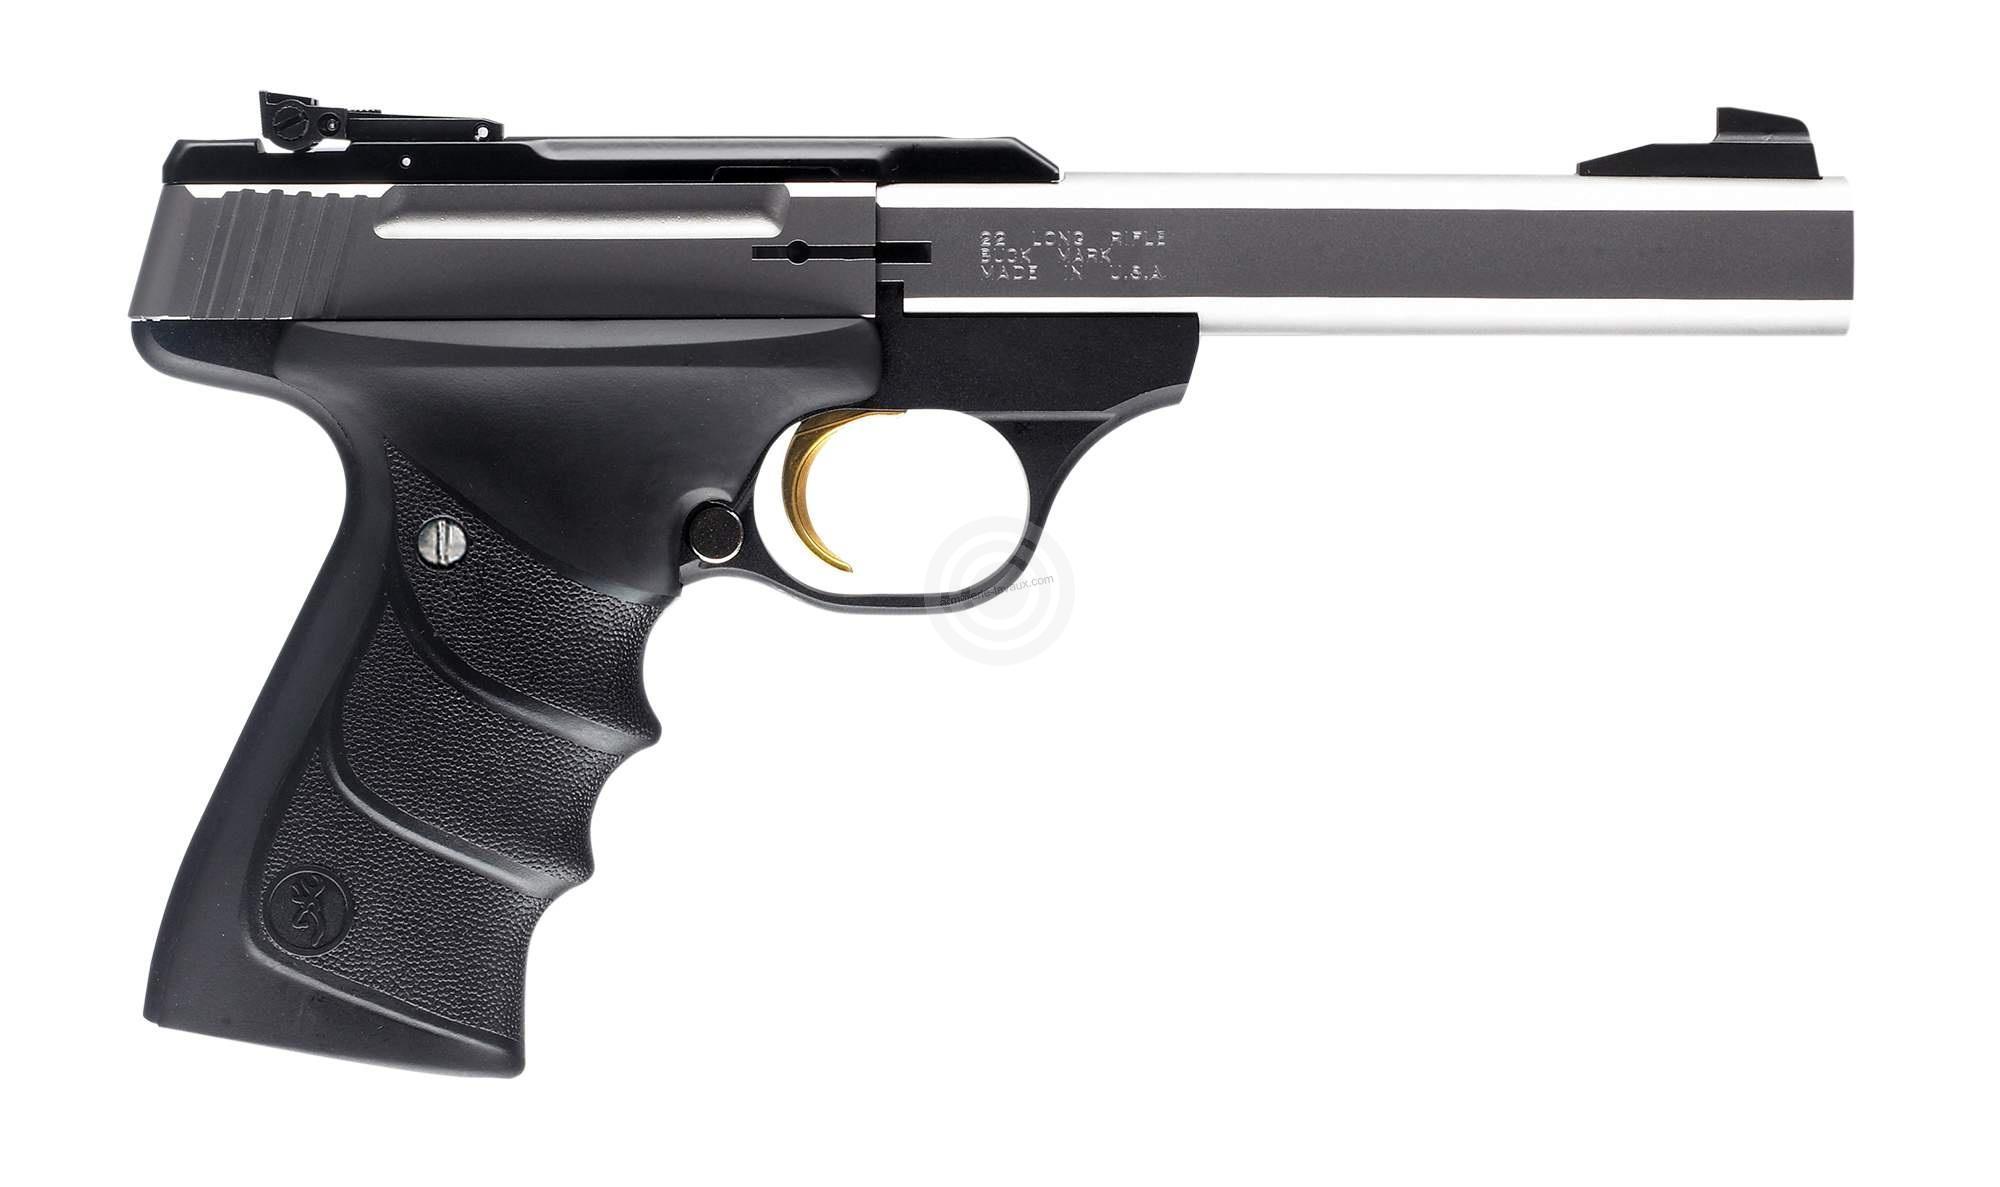 Pistolet BROWNING Buck Mark Standard Stainless URX calibre 22Lr